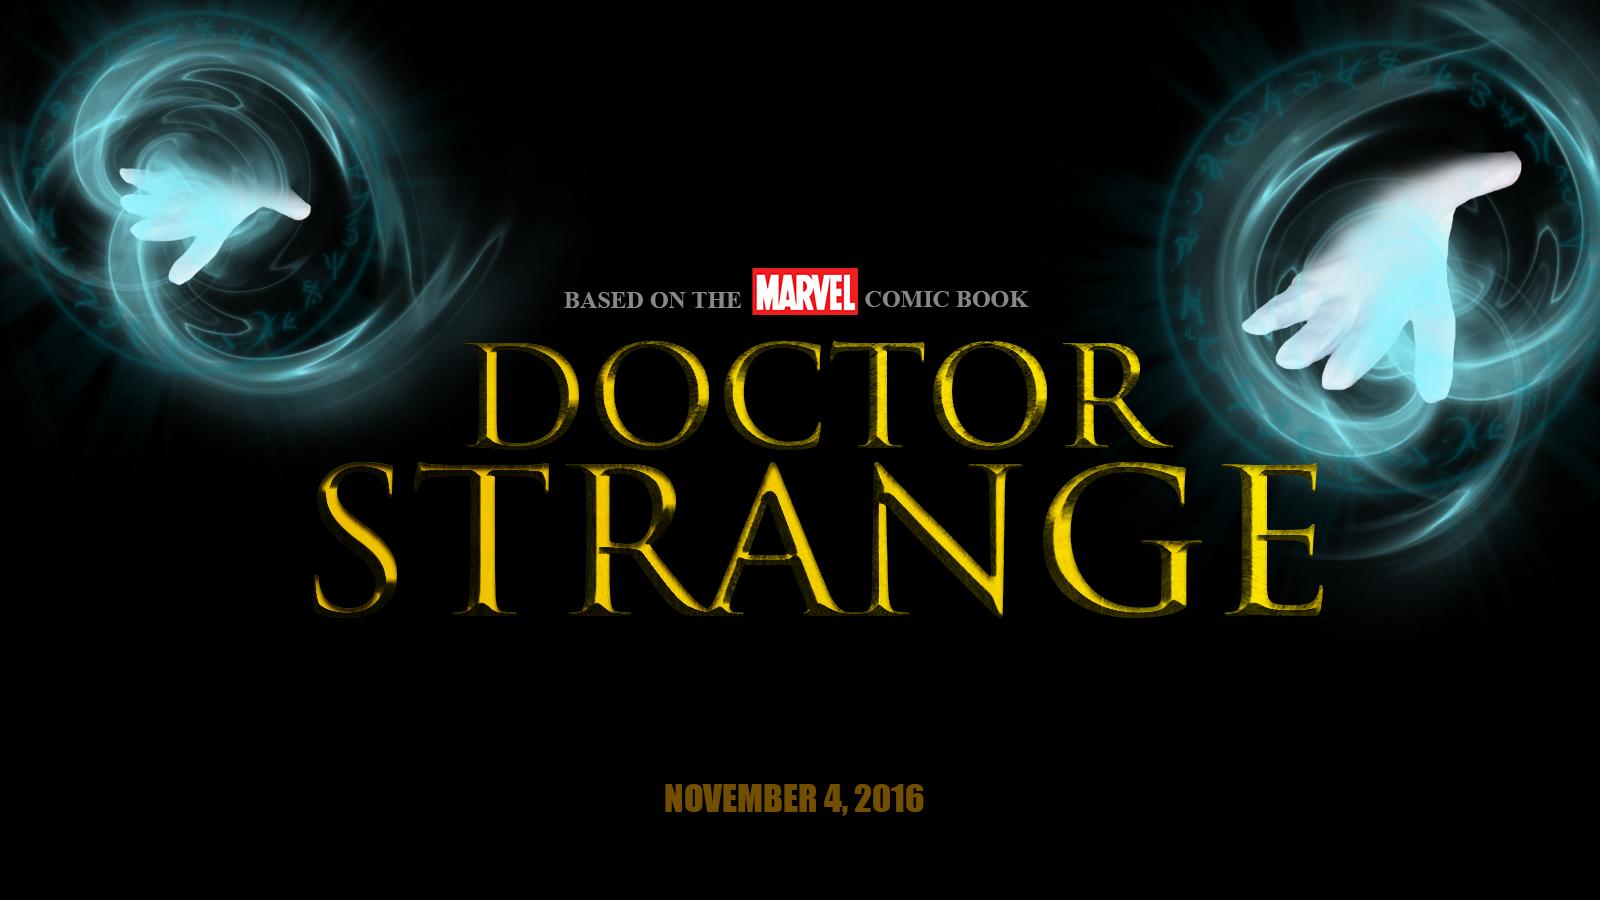 Doctor Strange Marvel Movie Wallpapers Widescreen Cinema: Doctor Strange Movie Logo By Chronoxiong On DeviantArt